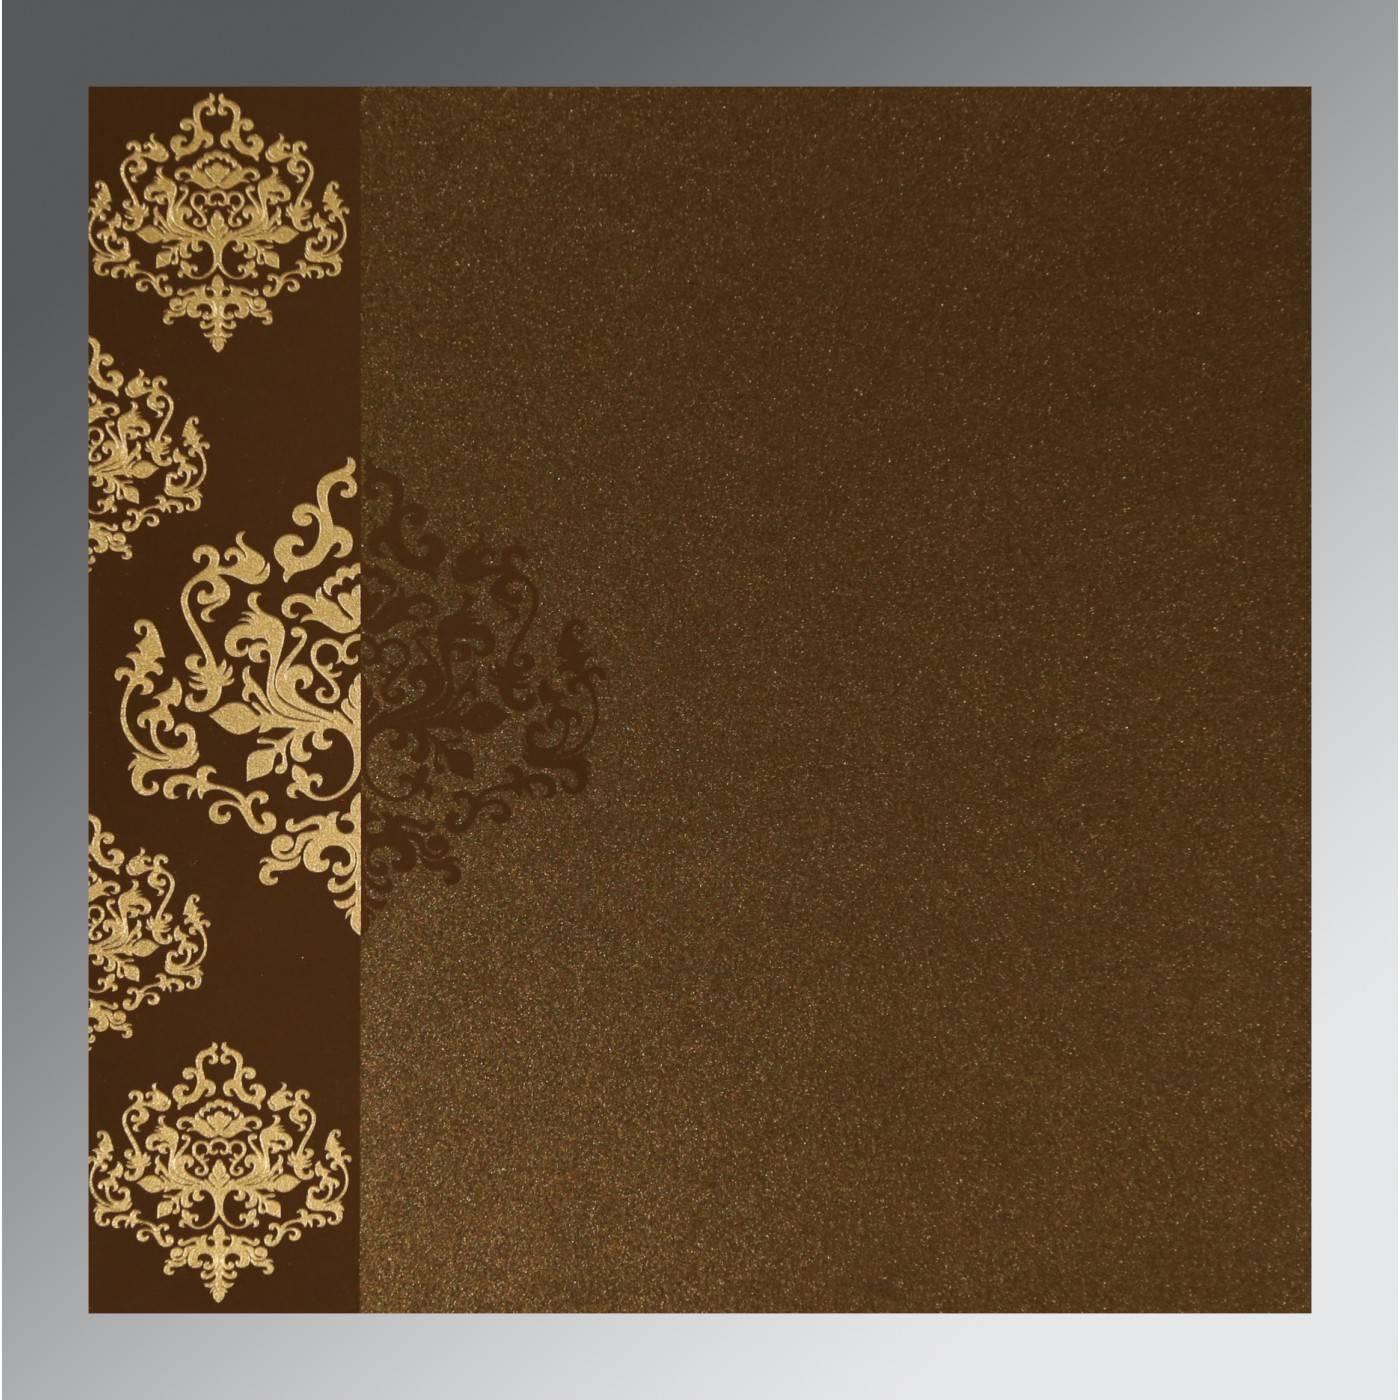 BROWN SHIMMERY DAMASK THEMED - SCREEN PRINTED WEDDING CARD : CIN-8254F - IndianWeddingCards